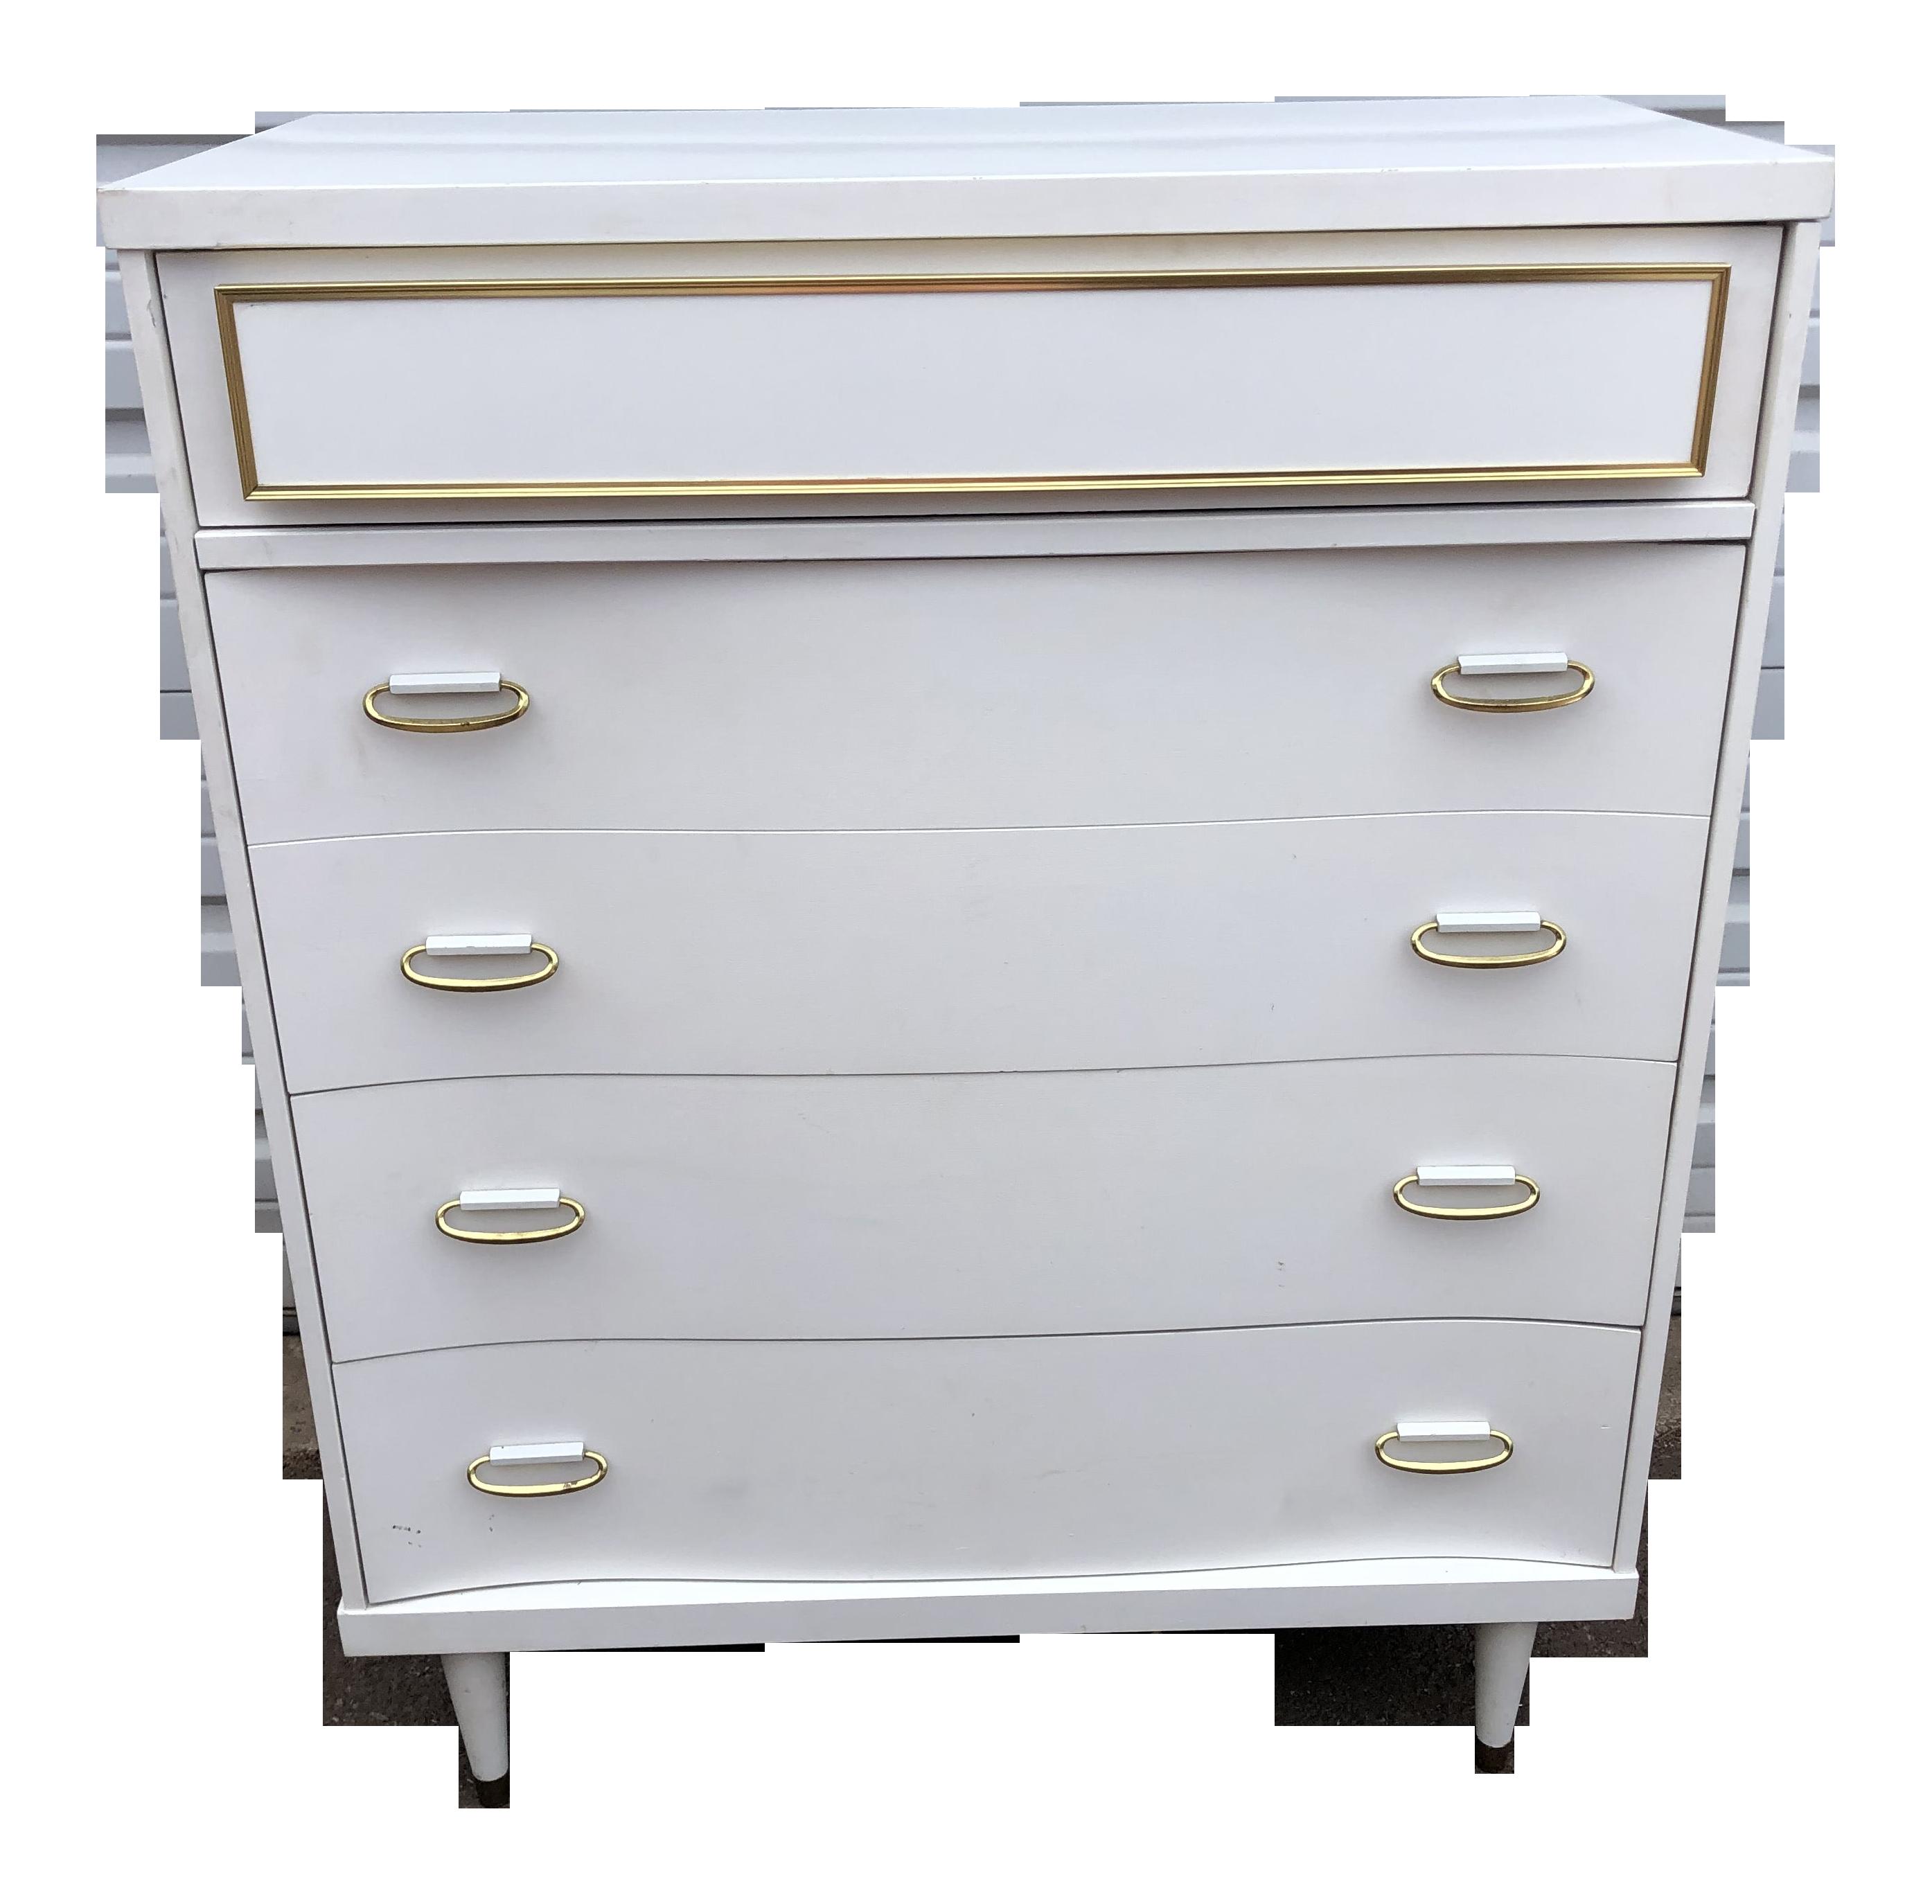 vintage bassett mid century modern white and gold chest of drawers dresser